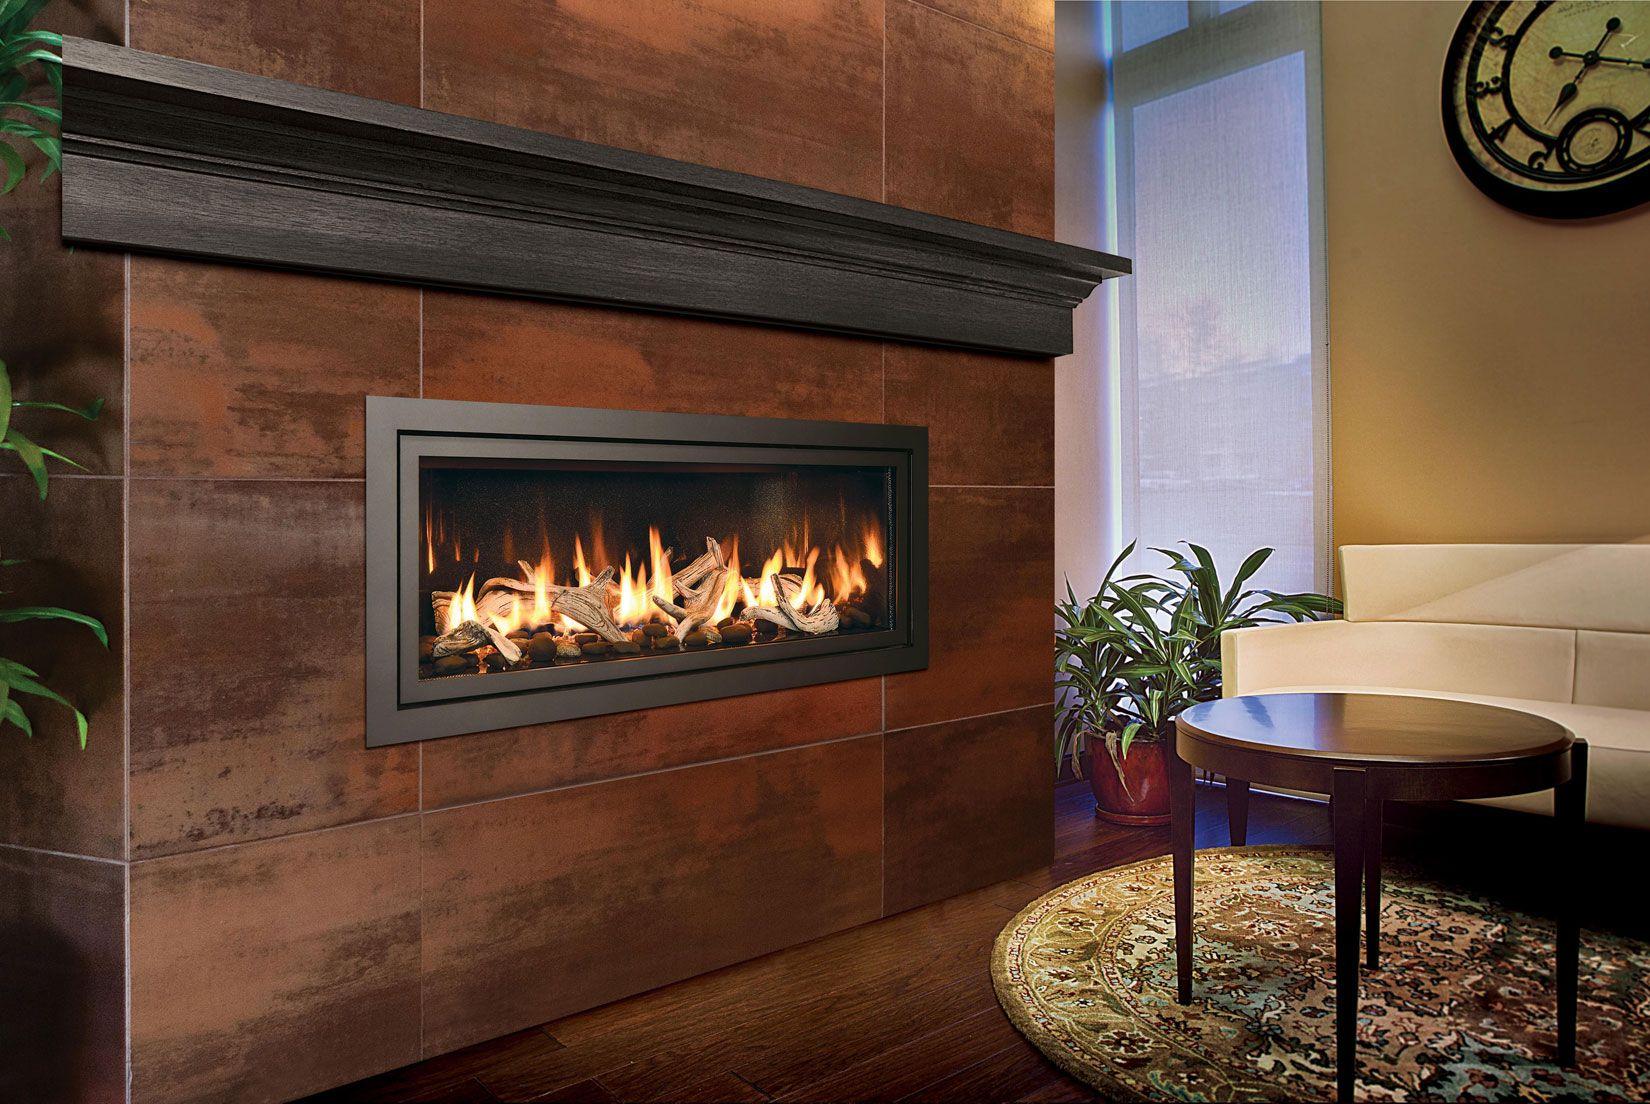 Ml47 Mod Grace Tradtns Room2 Jpg 1650 1104 Modern Fireplace